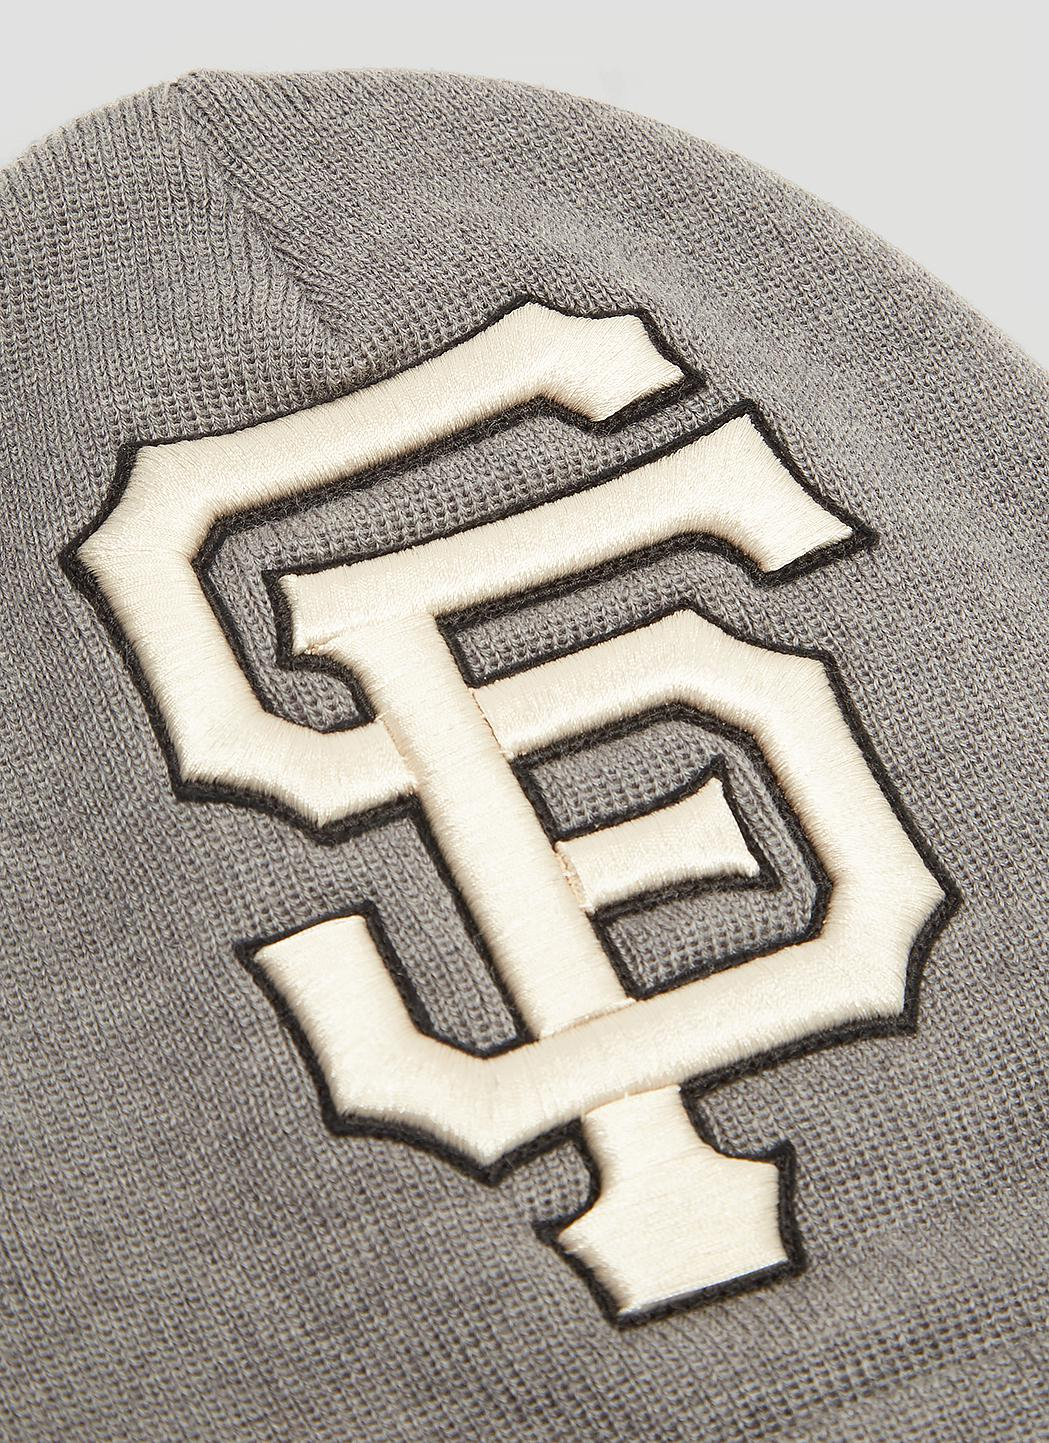 Lyst - Gucci Sf Giants Hat In Grey in Gray e08ca735929